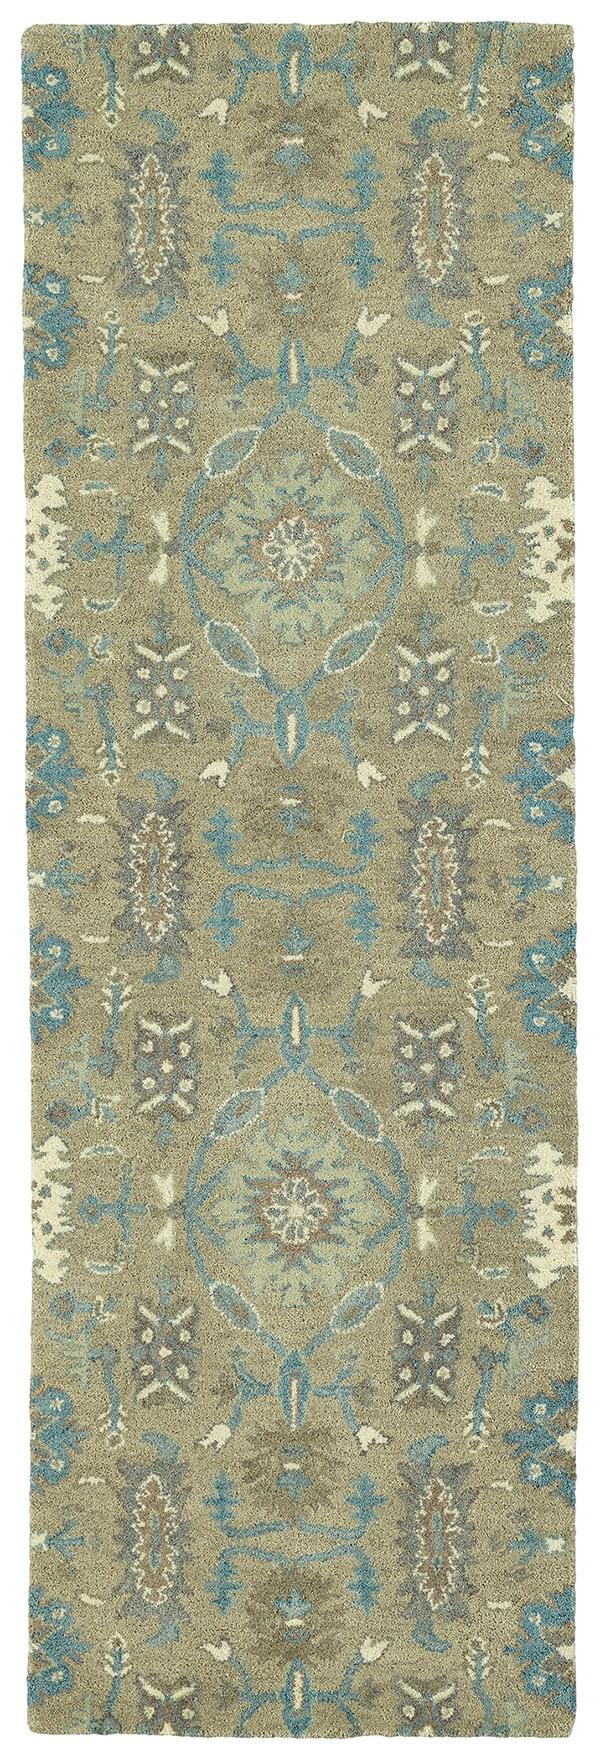 Sage (59) Traditional / Oriental Area Rug